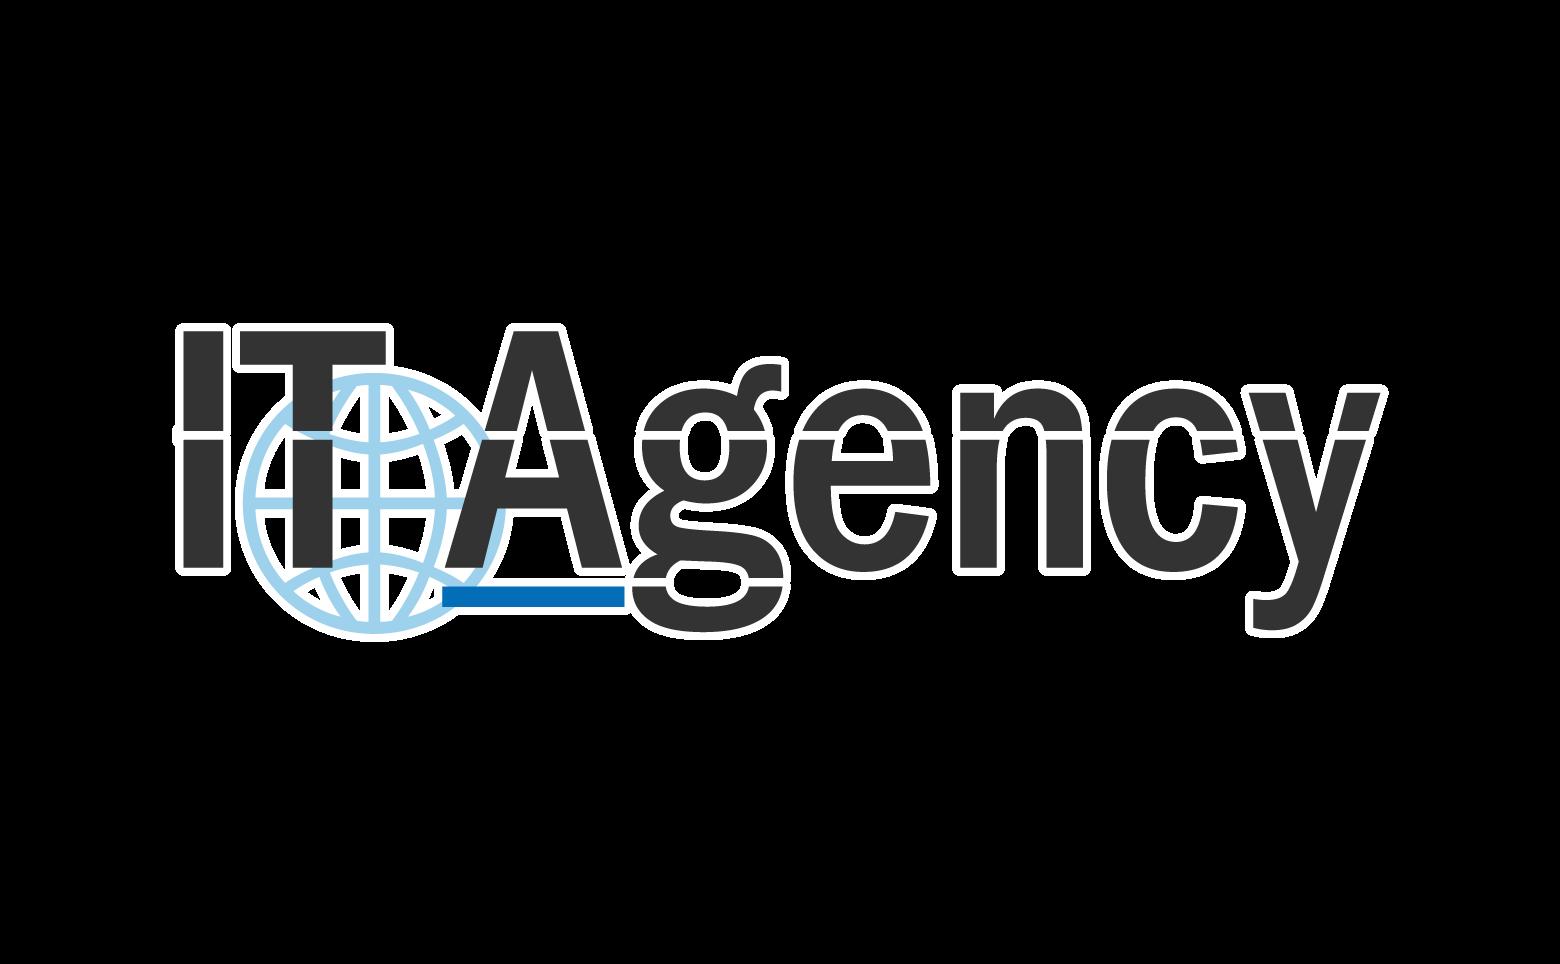 IT Agency (アイティーエージェンシー)|奈良県橿原市の広告デザイン事務所